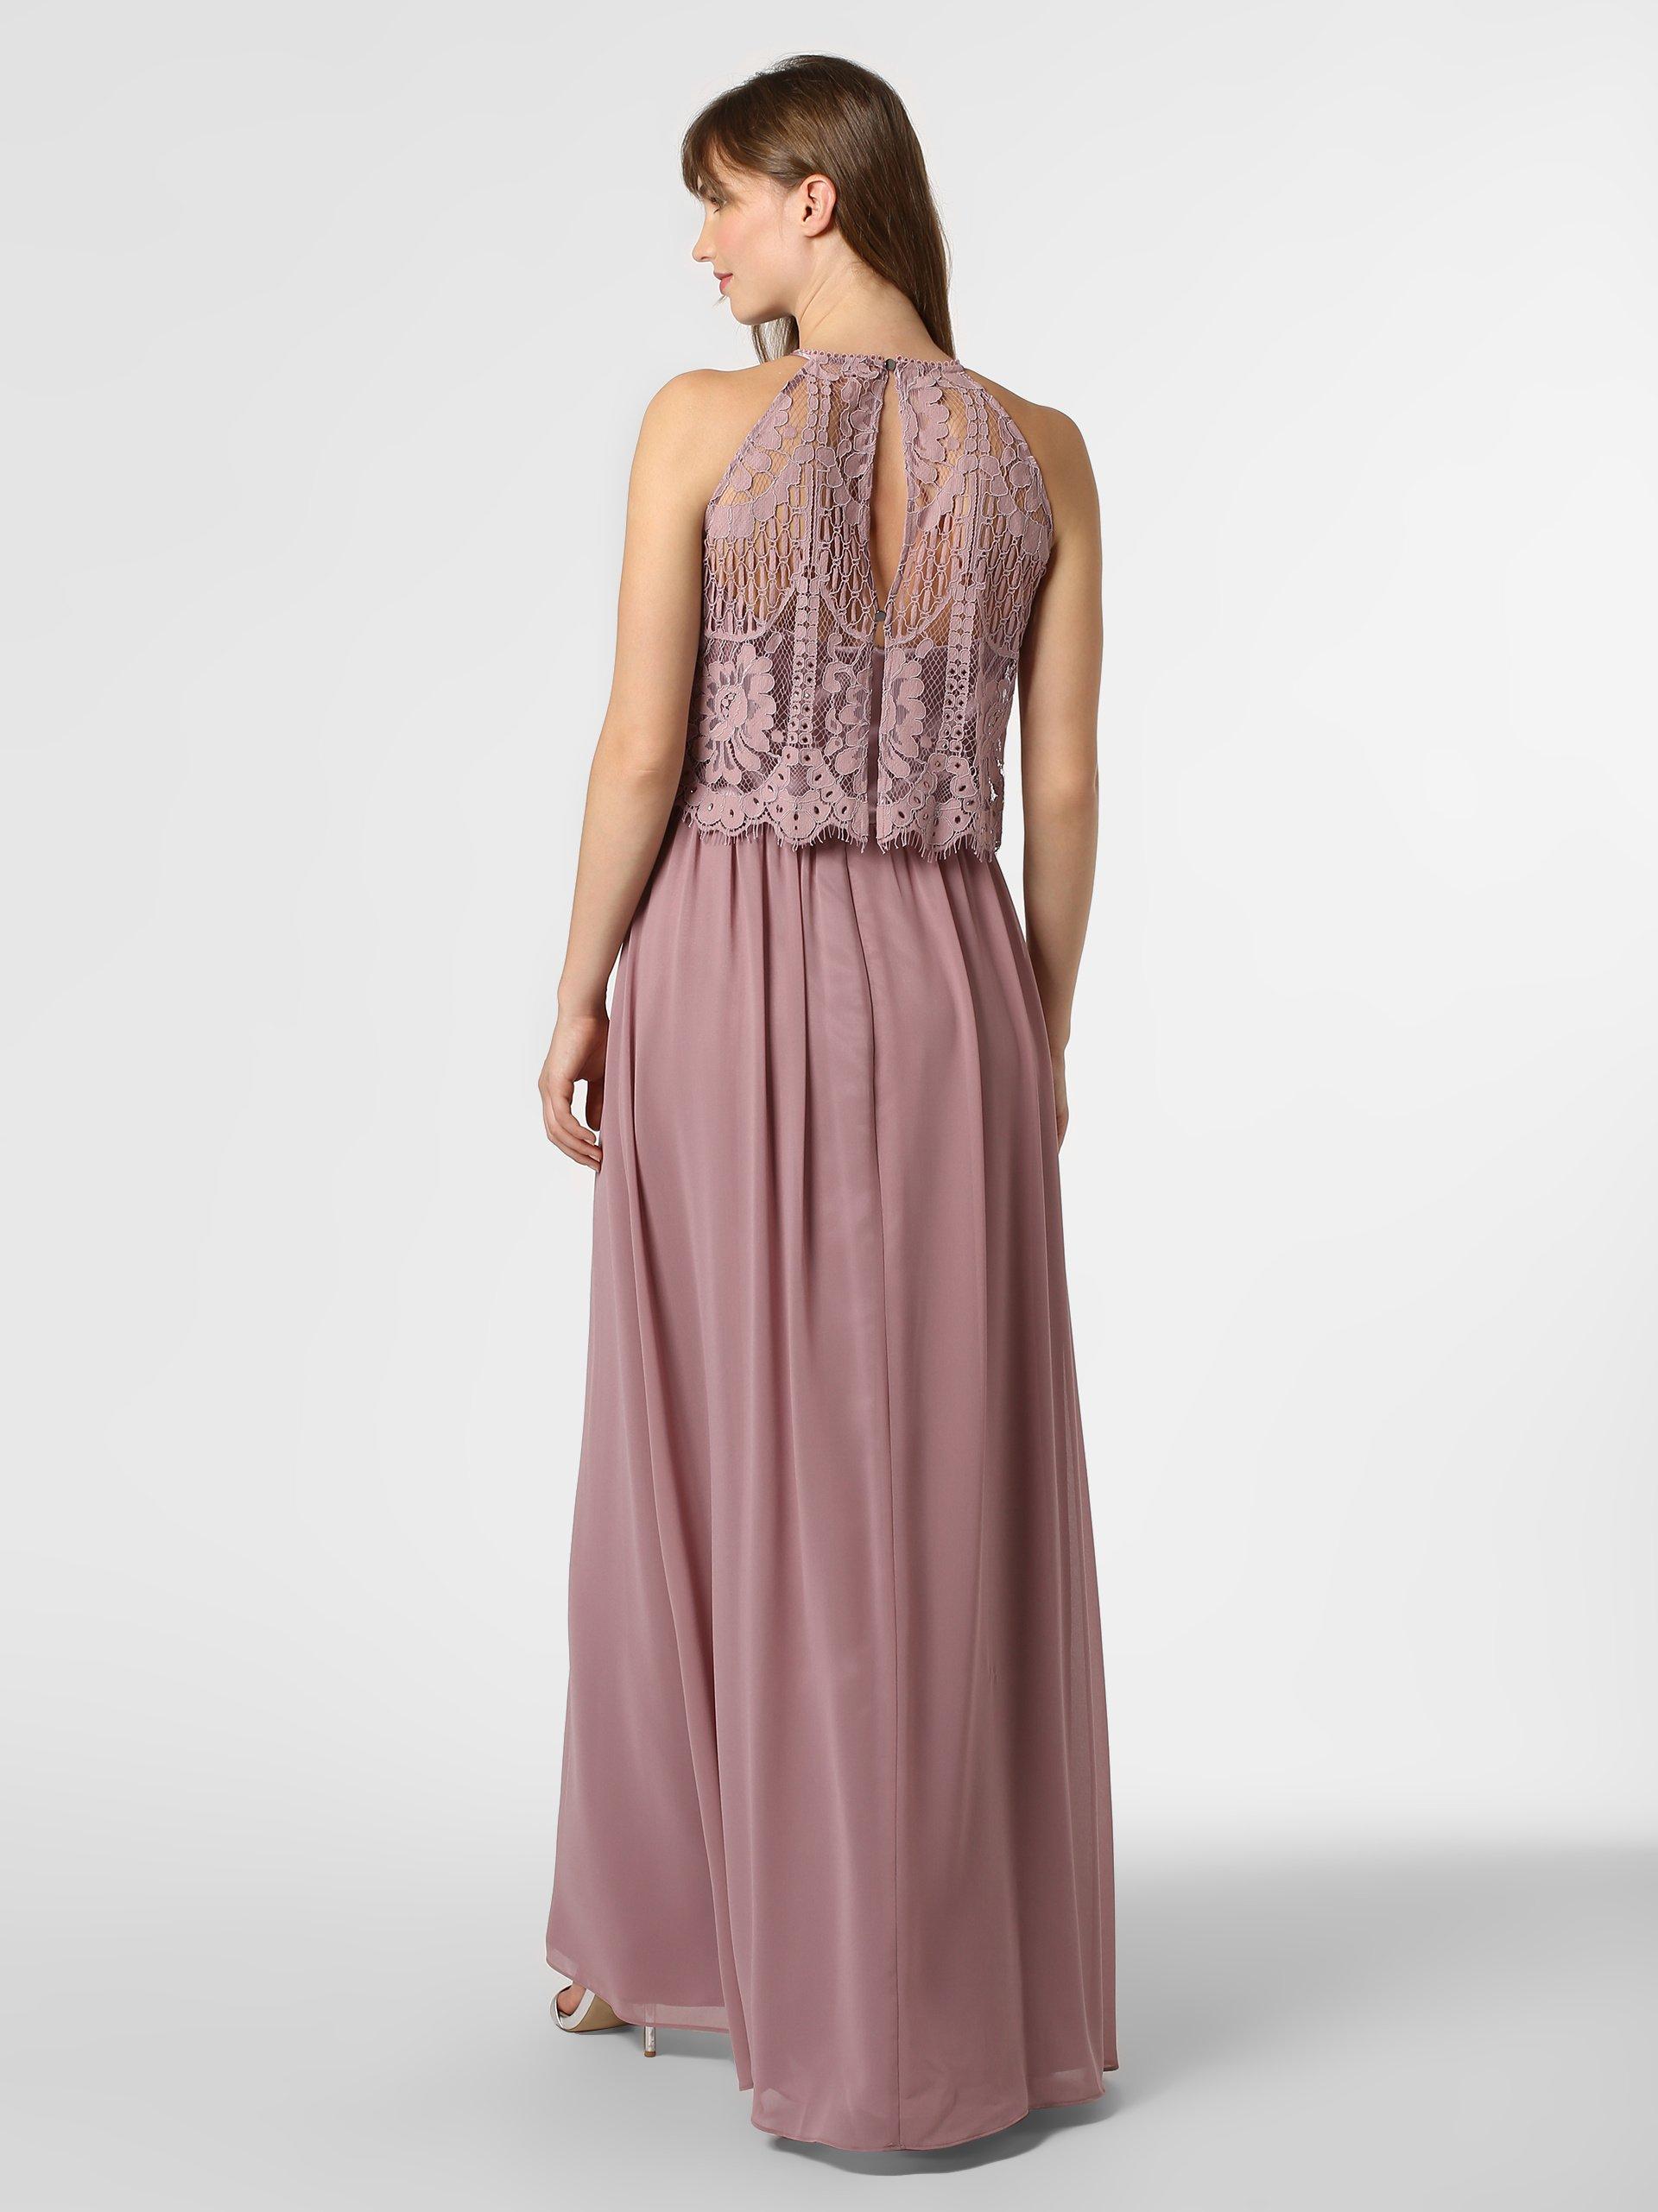 VM Damska sukienka wieczorowa